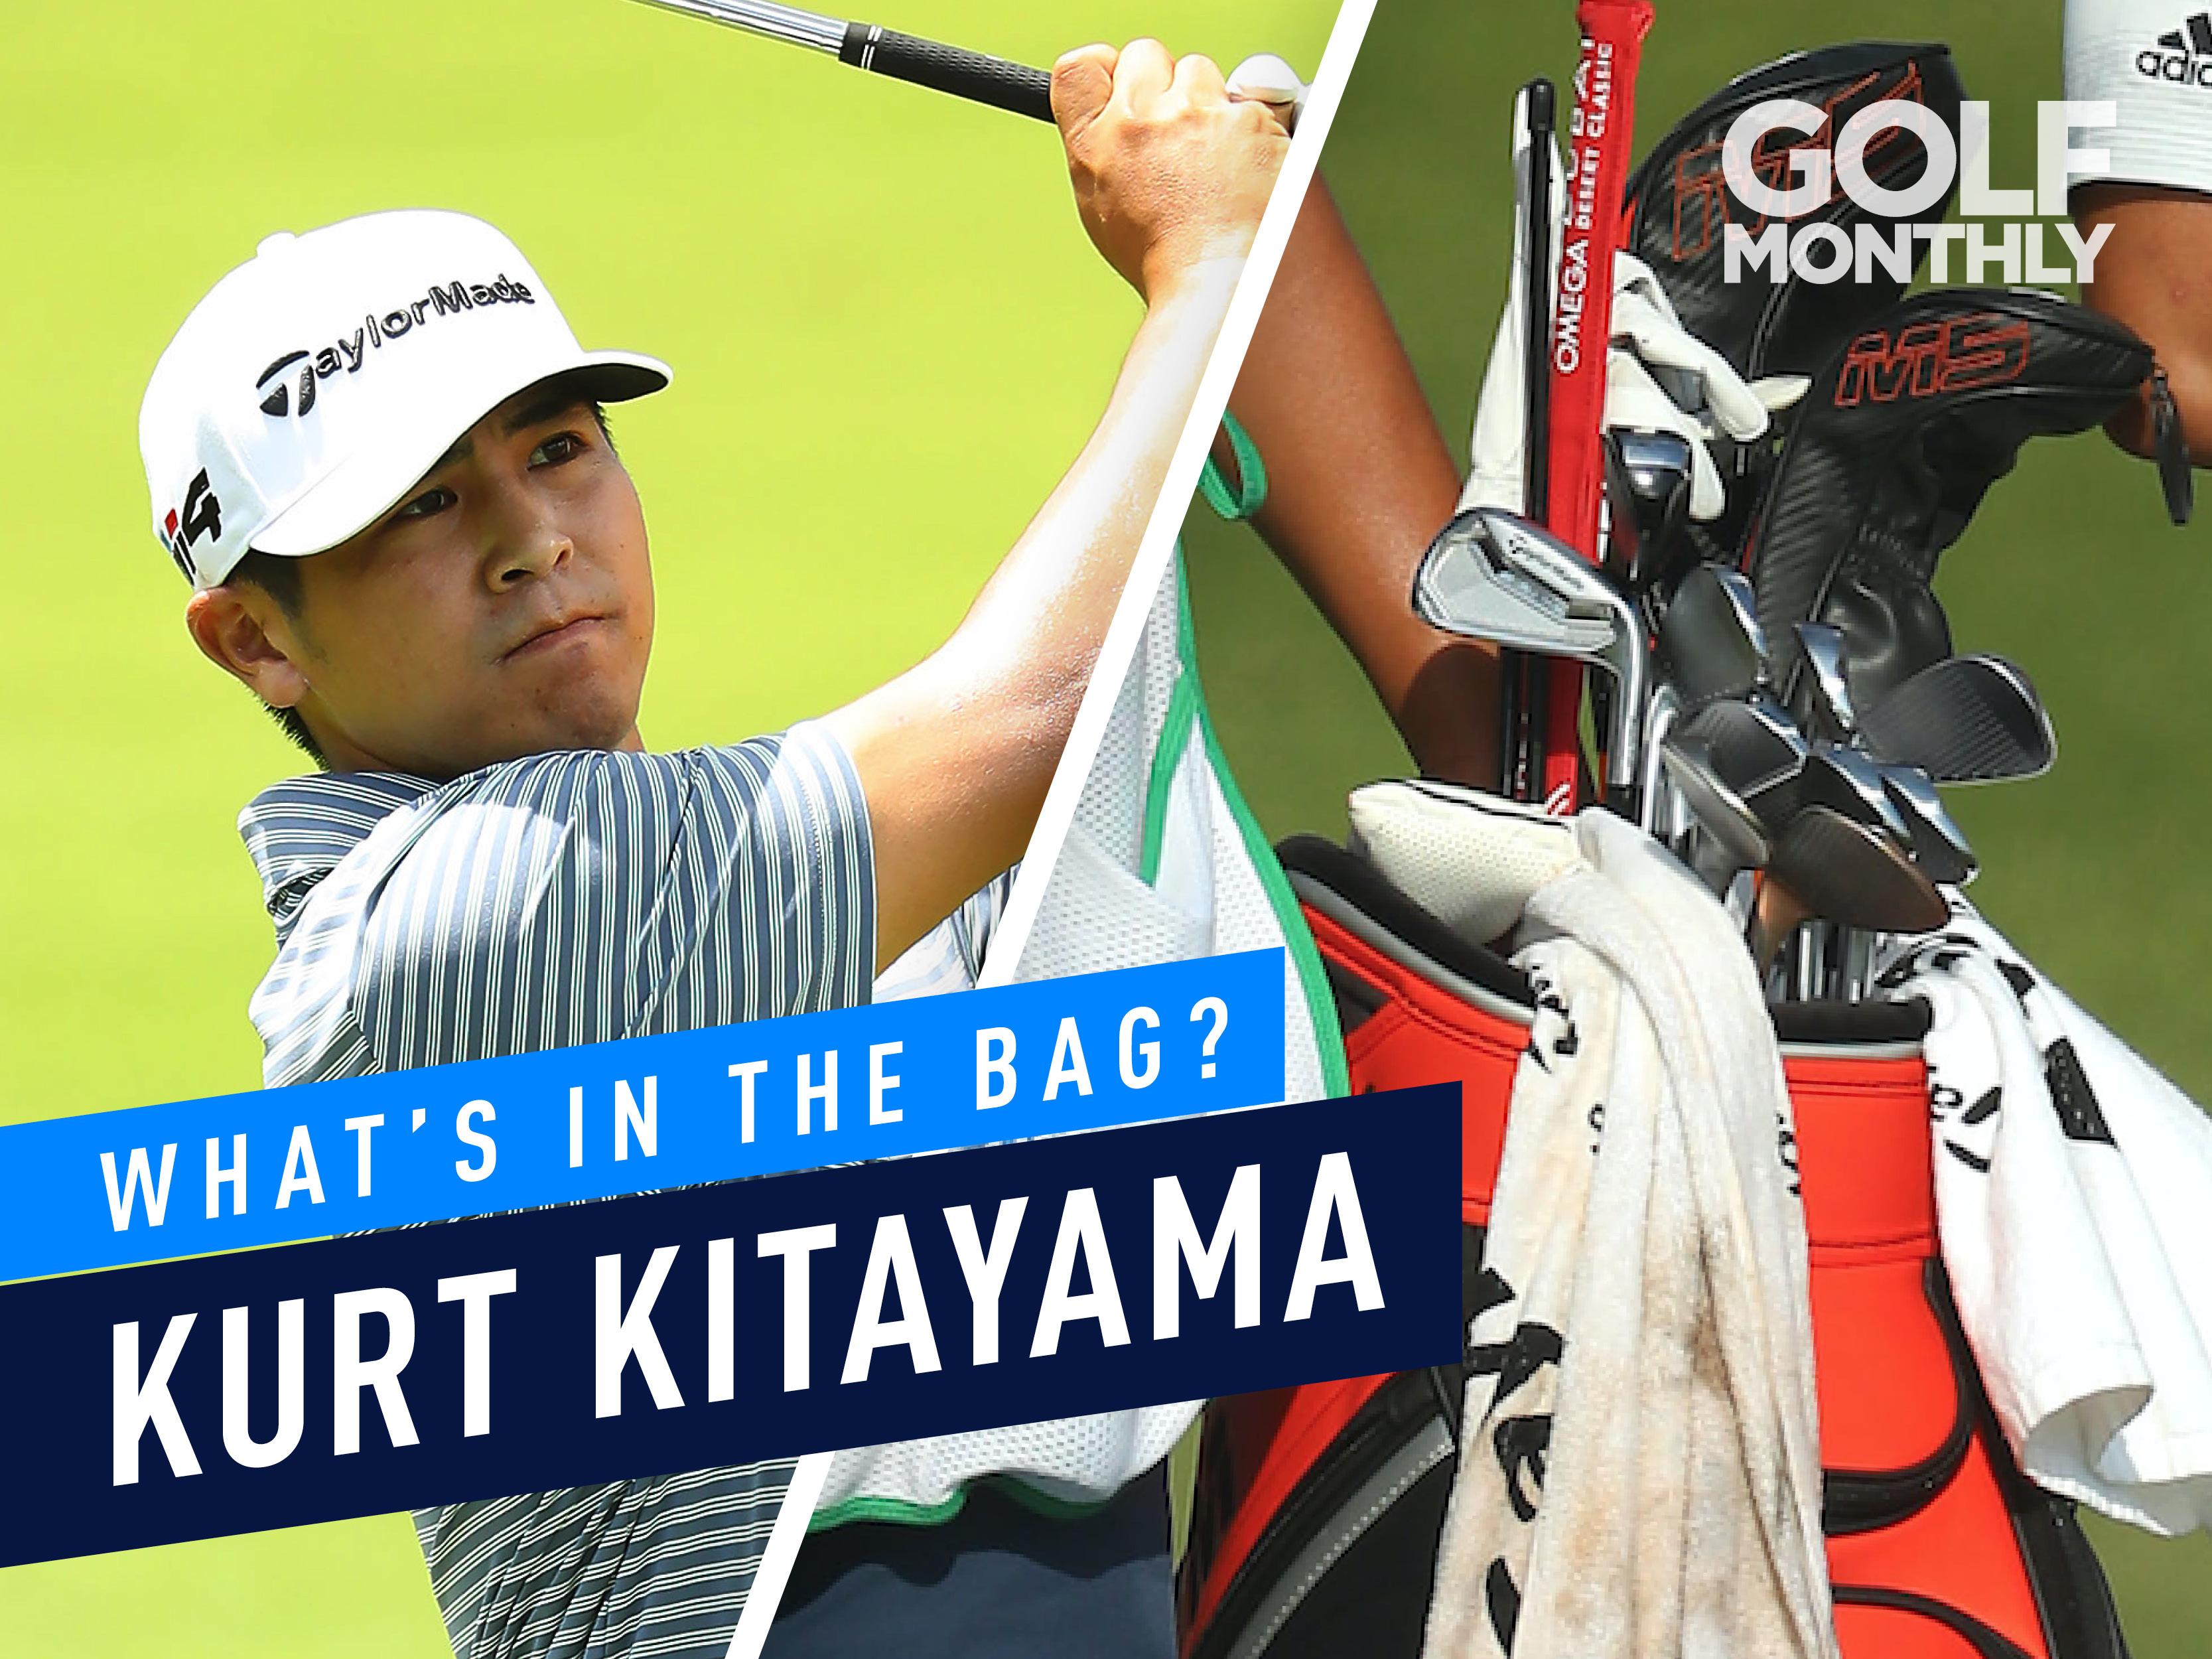 Kurt Kitayama What's In The Bag